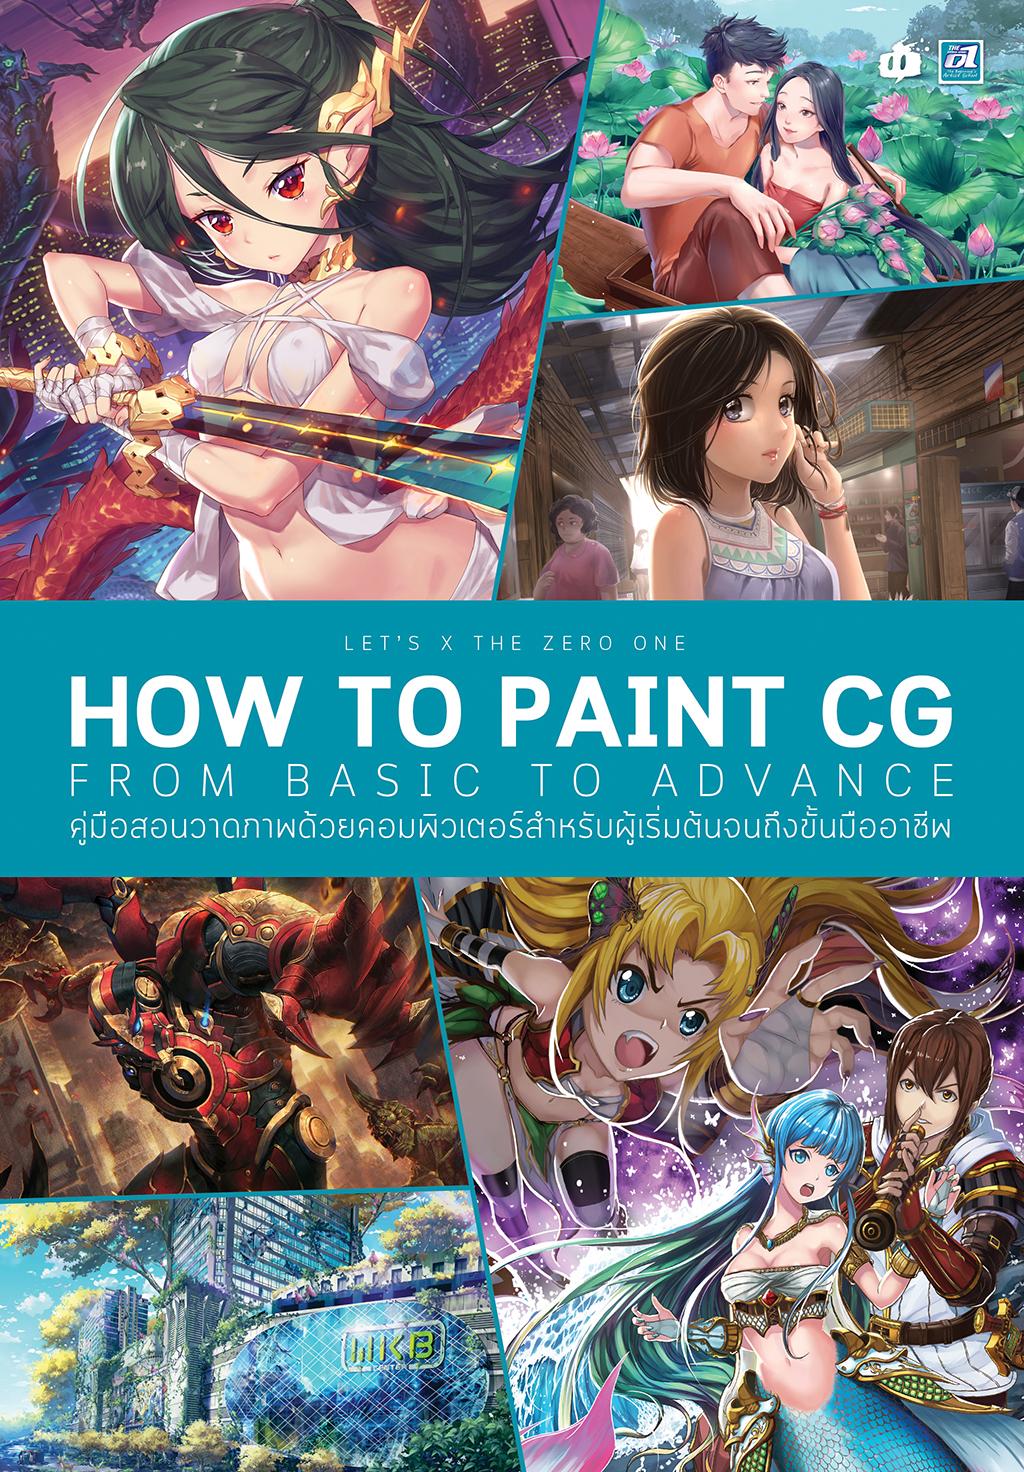 Let's x The Zero One How to Paint CG : From Basic to Advance คู่มือสอนวาดภาพด้วยคอมพิวเตอร์สำหรับผู้